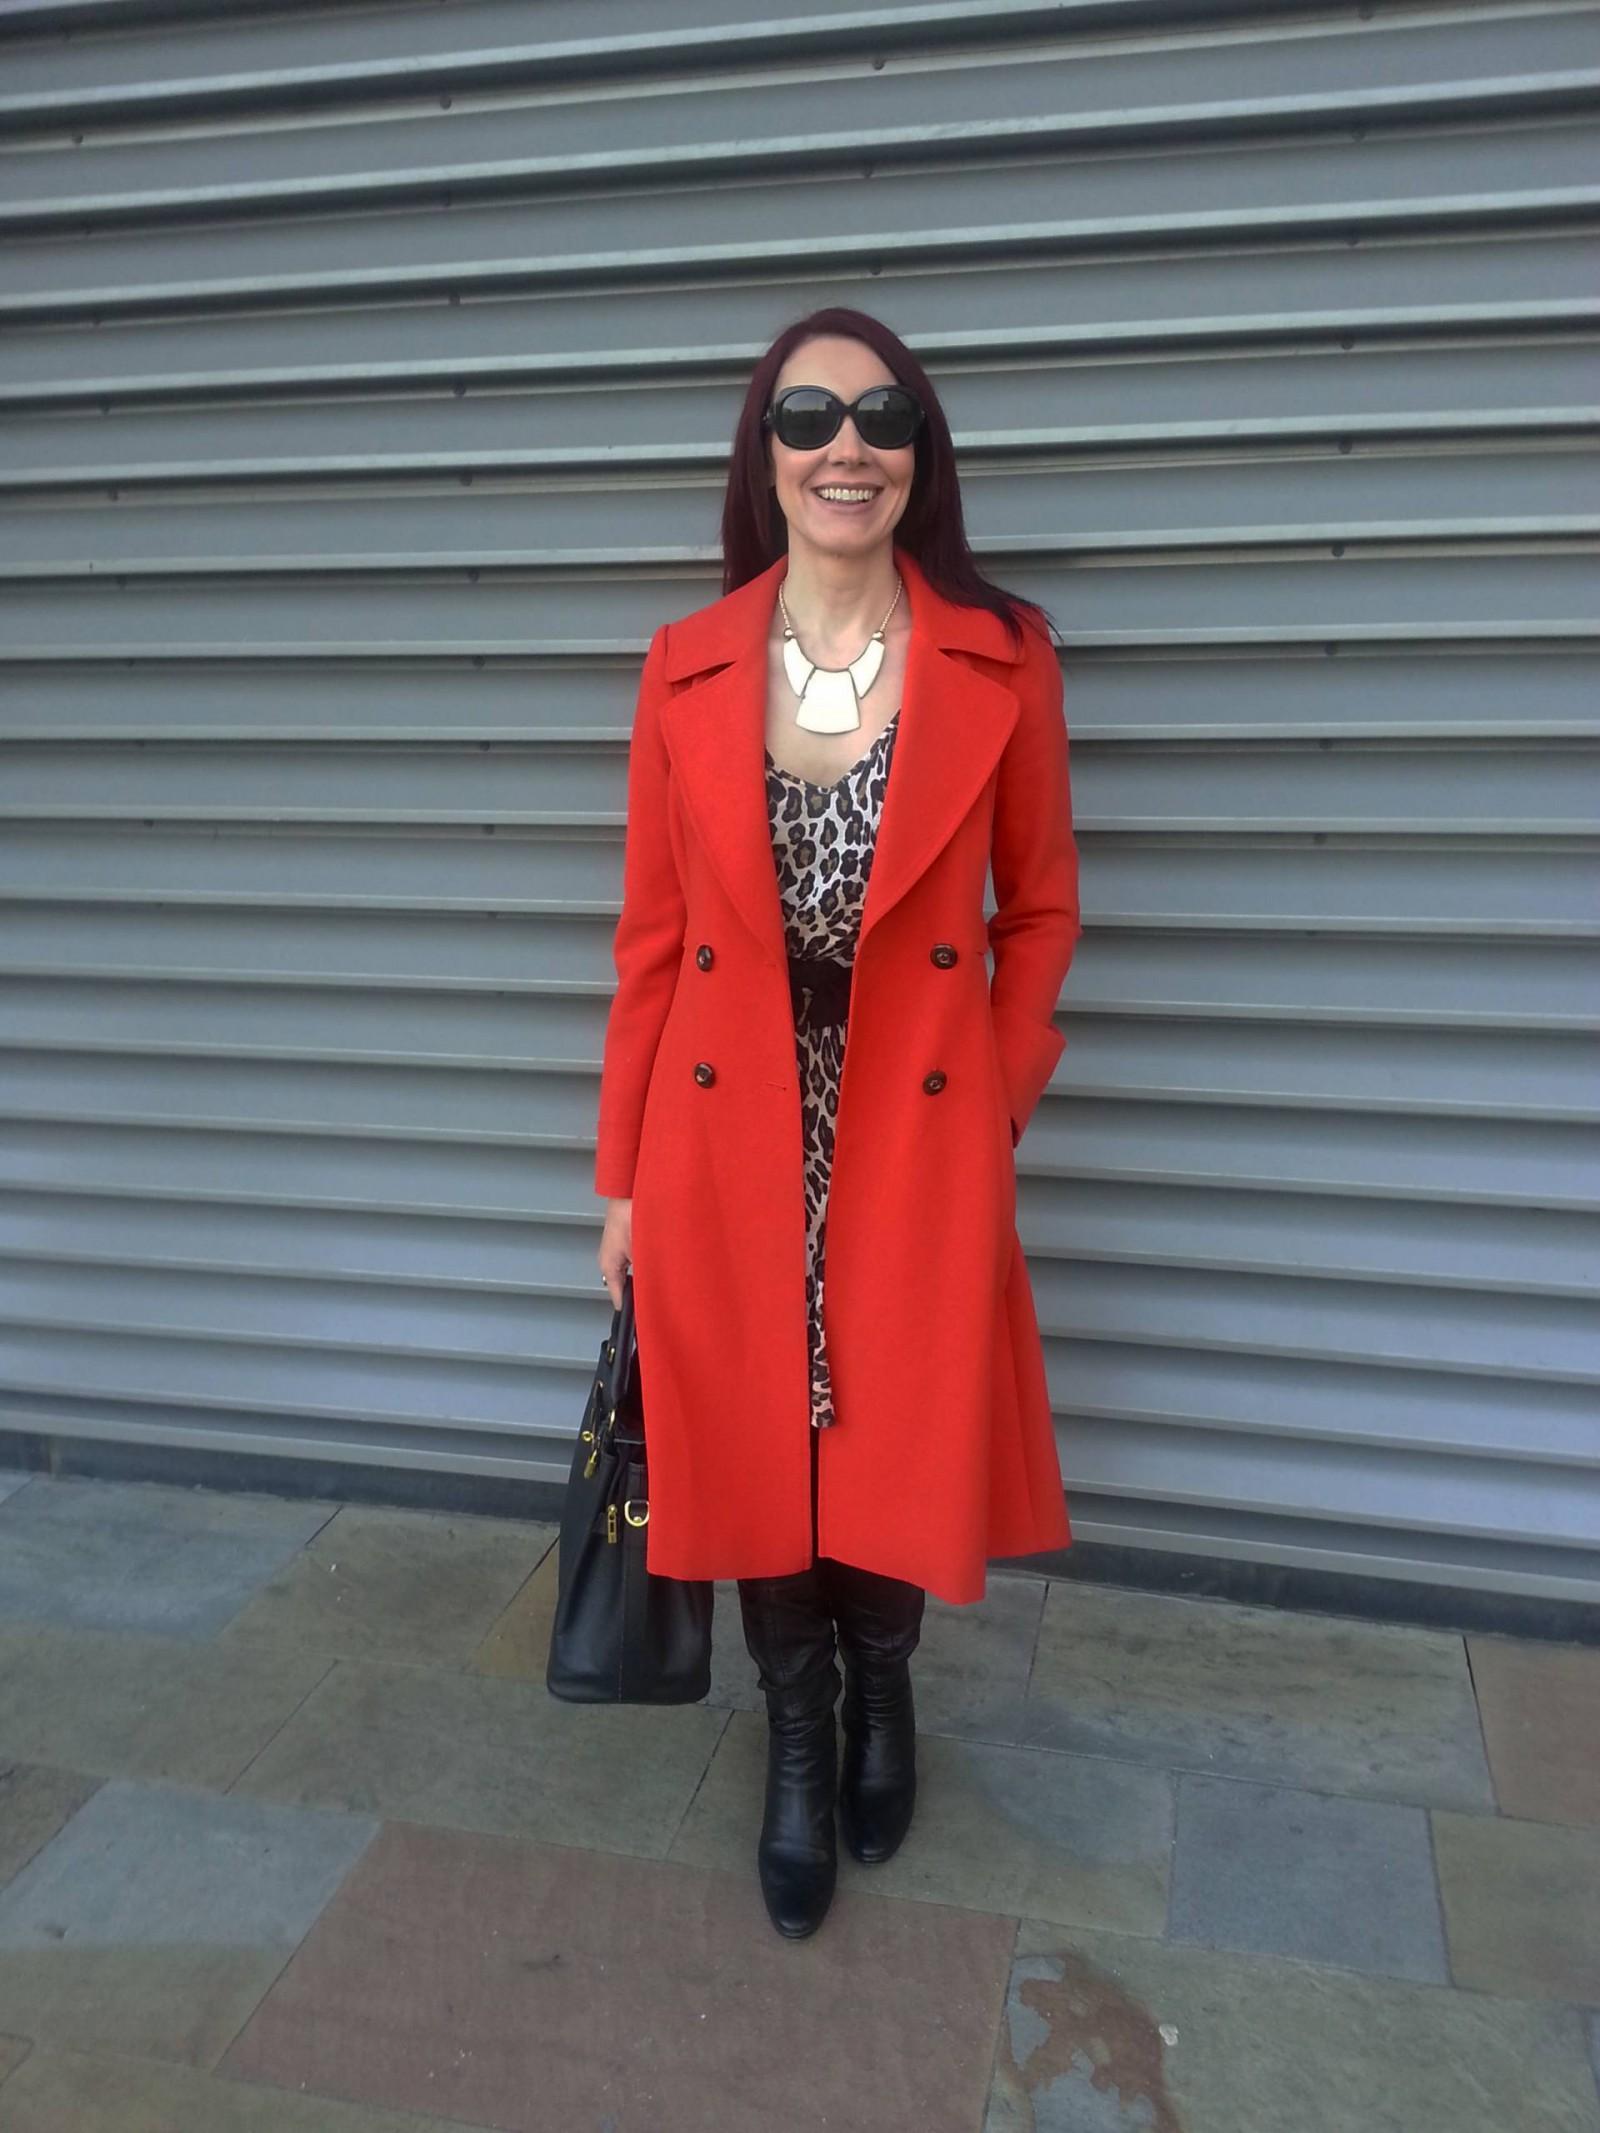 Red J by Jasper Conran Coat and Zara Leopard Print Dress